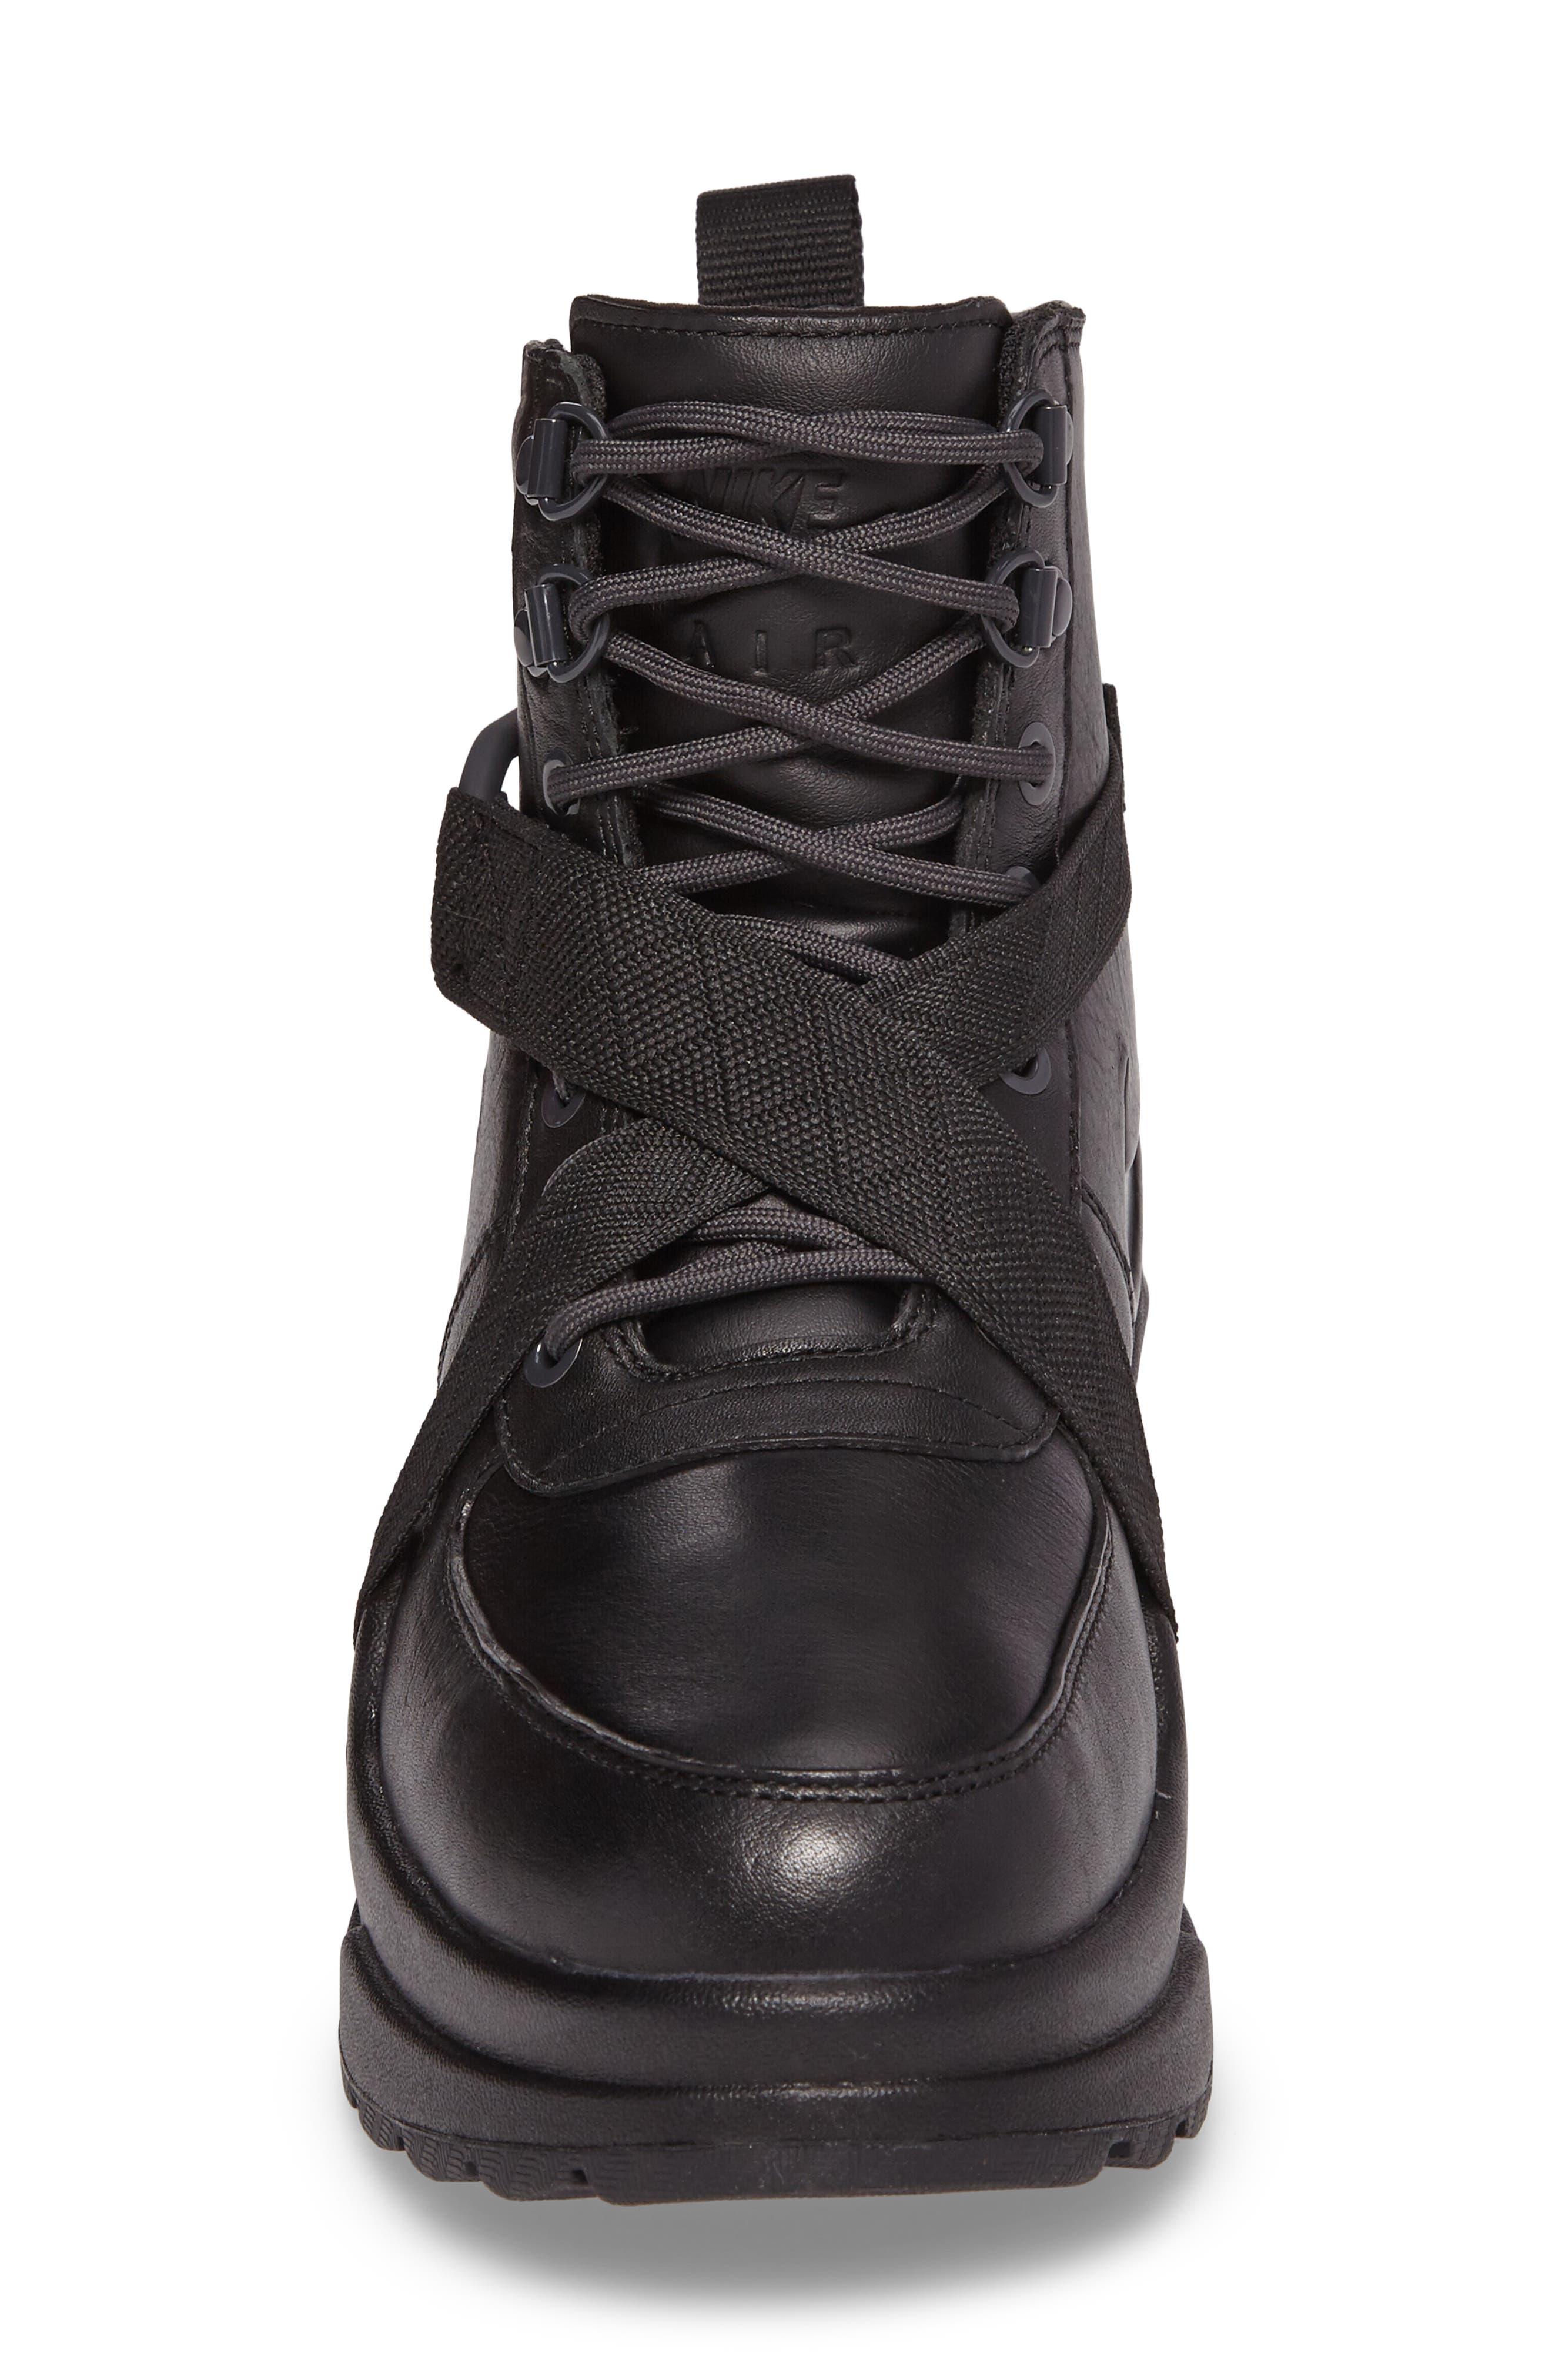 Air Max Goadome Sneaker Boot,                             Alternate thumbnail 4, color,                             BLACK/ ANTHRACITE/ BLACK